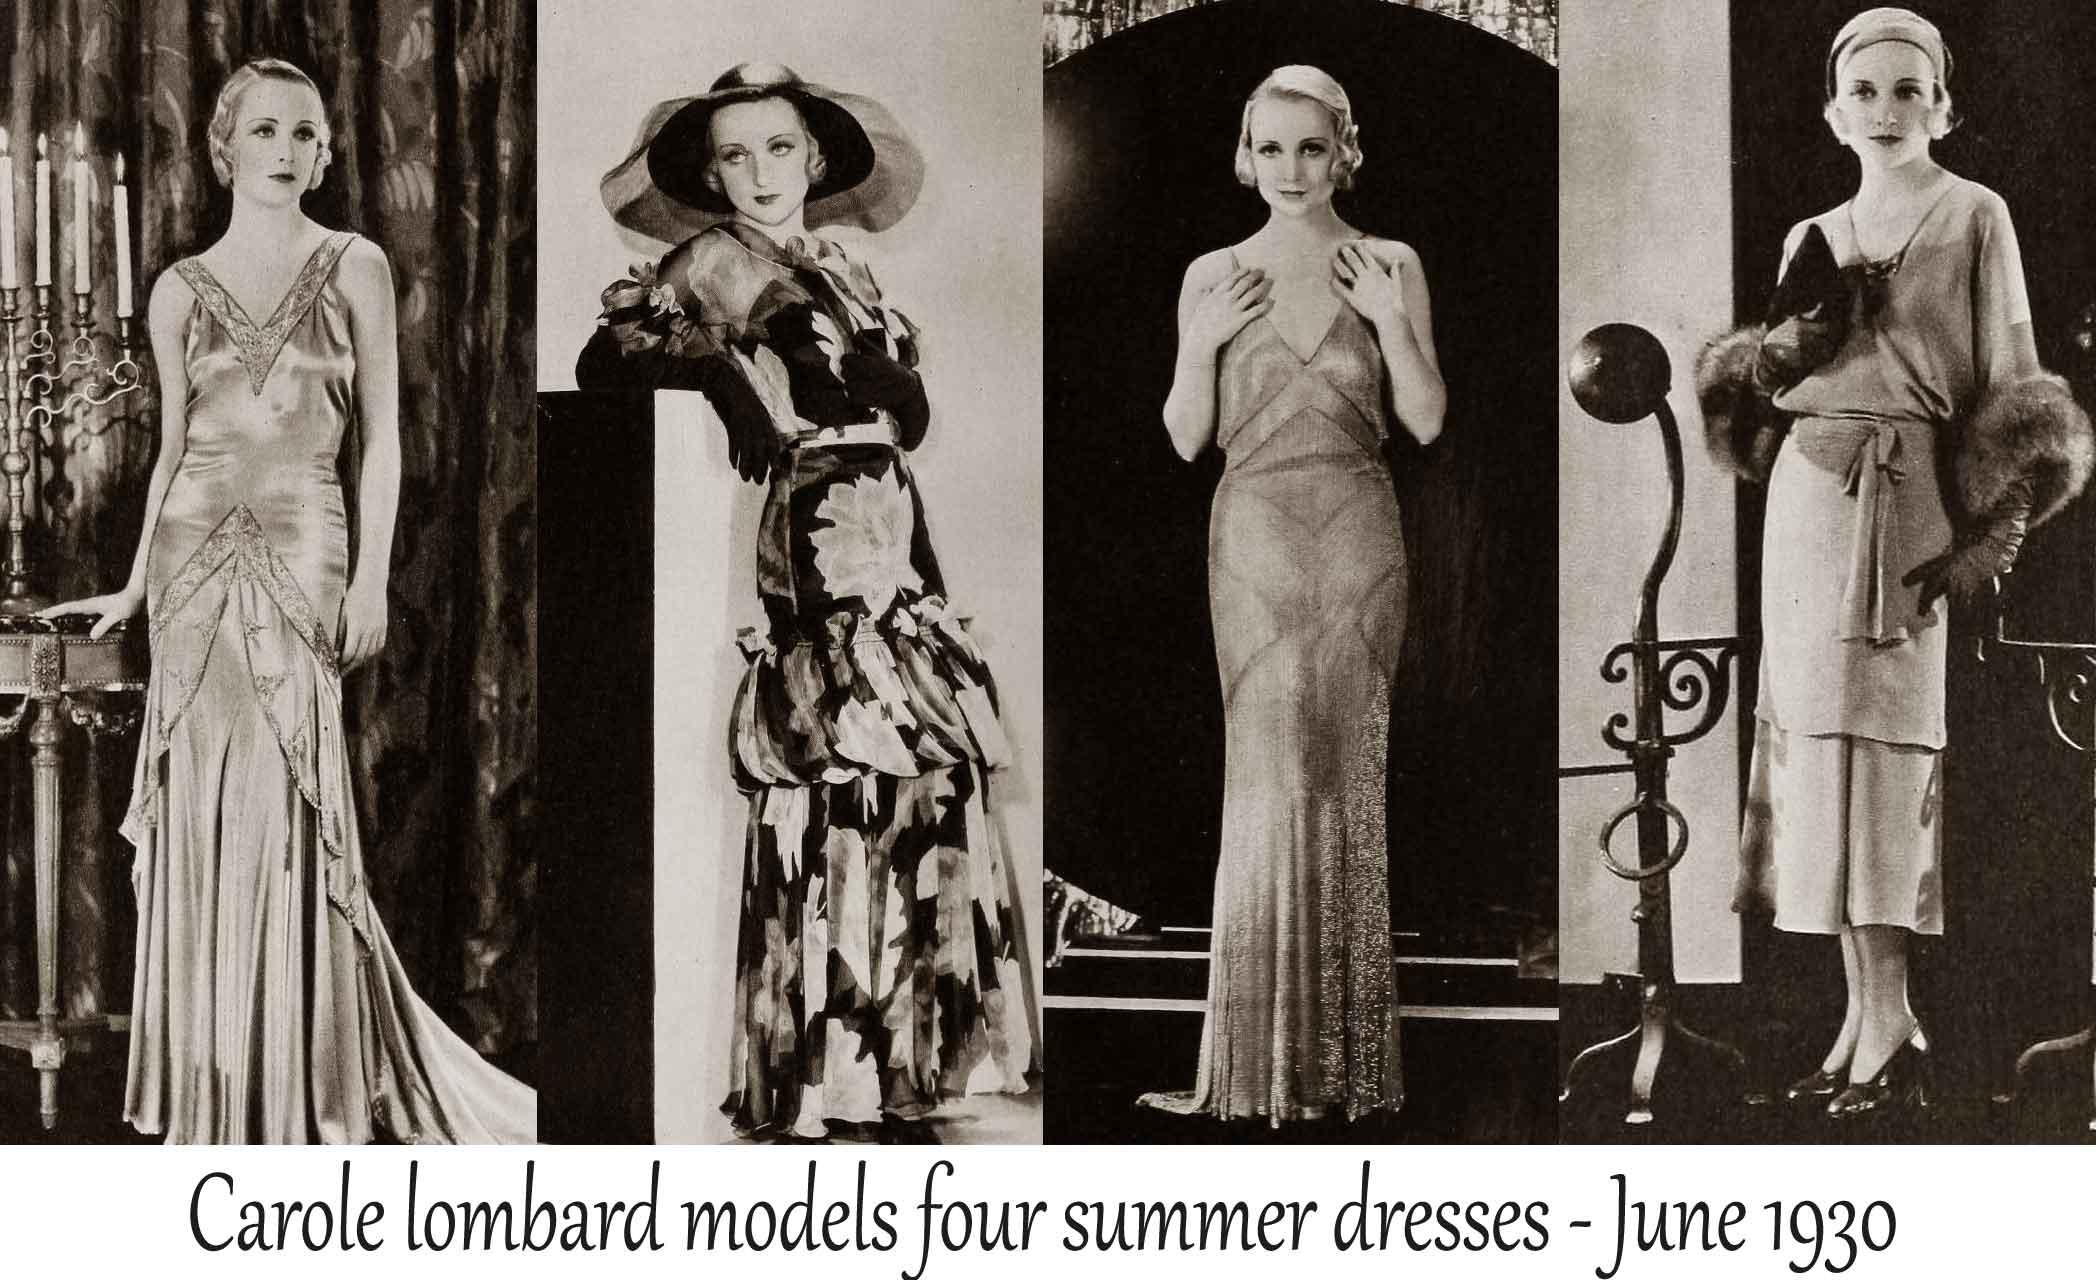 1930 Hollywood Summer Fashion – June 1930